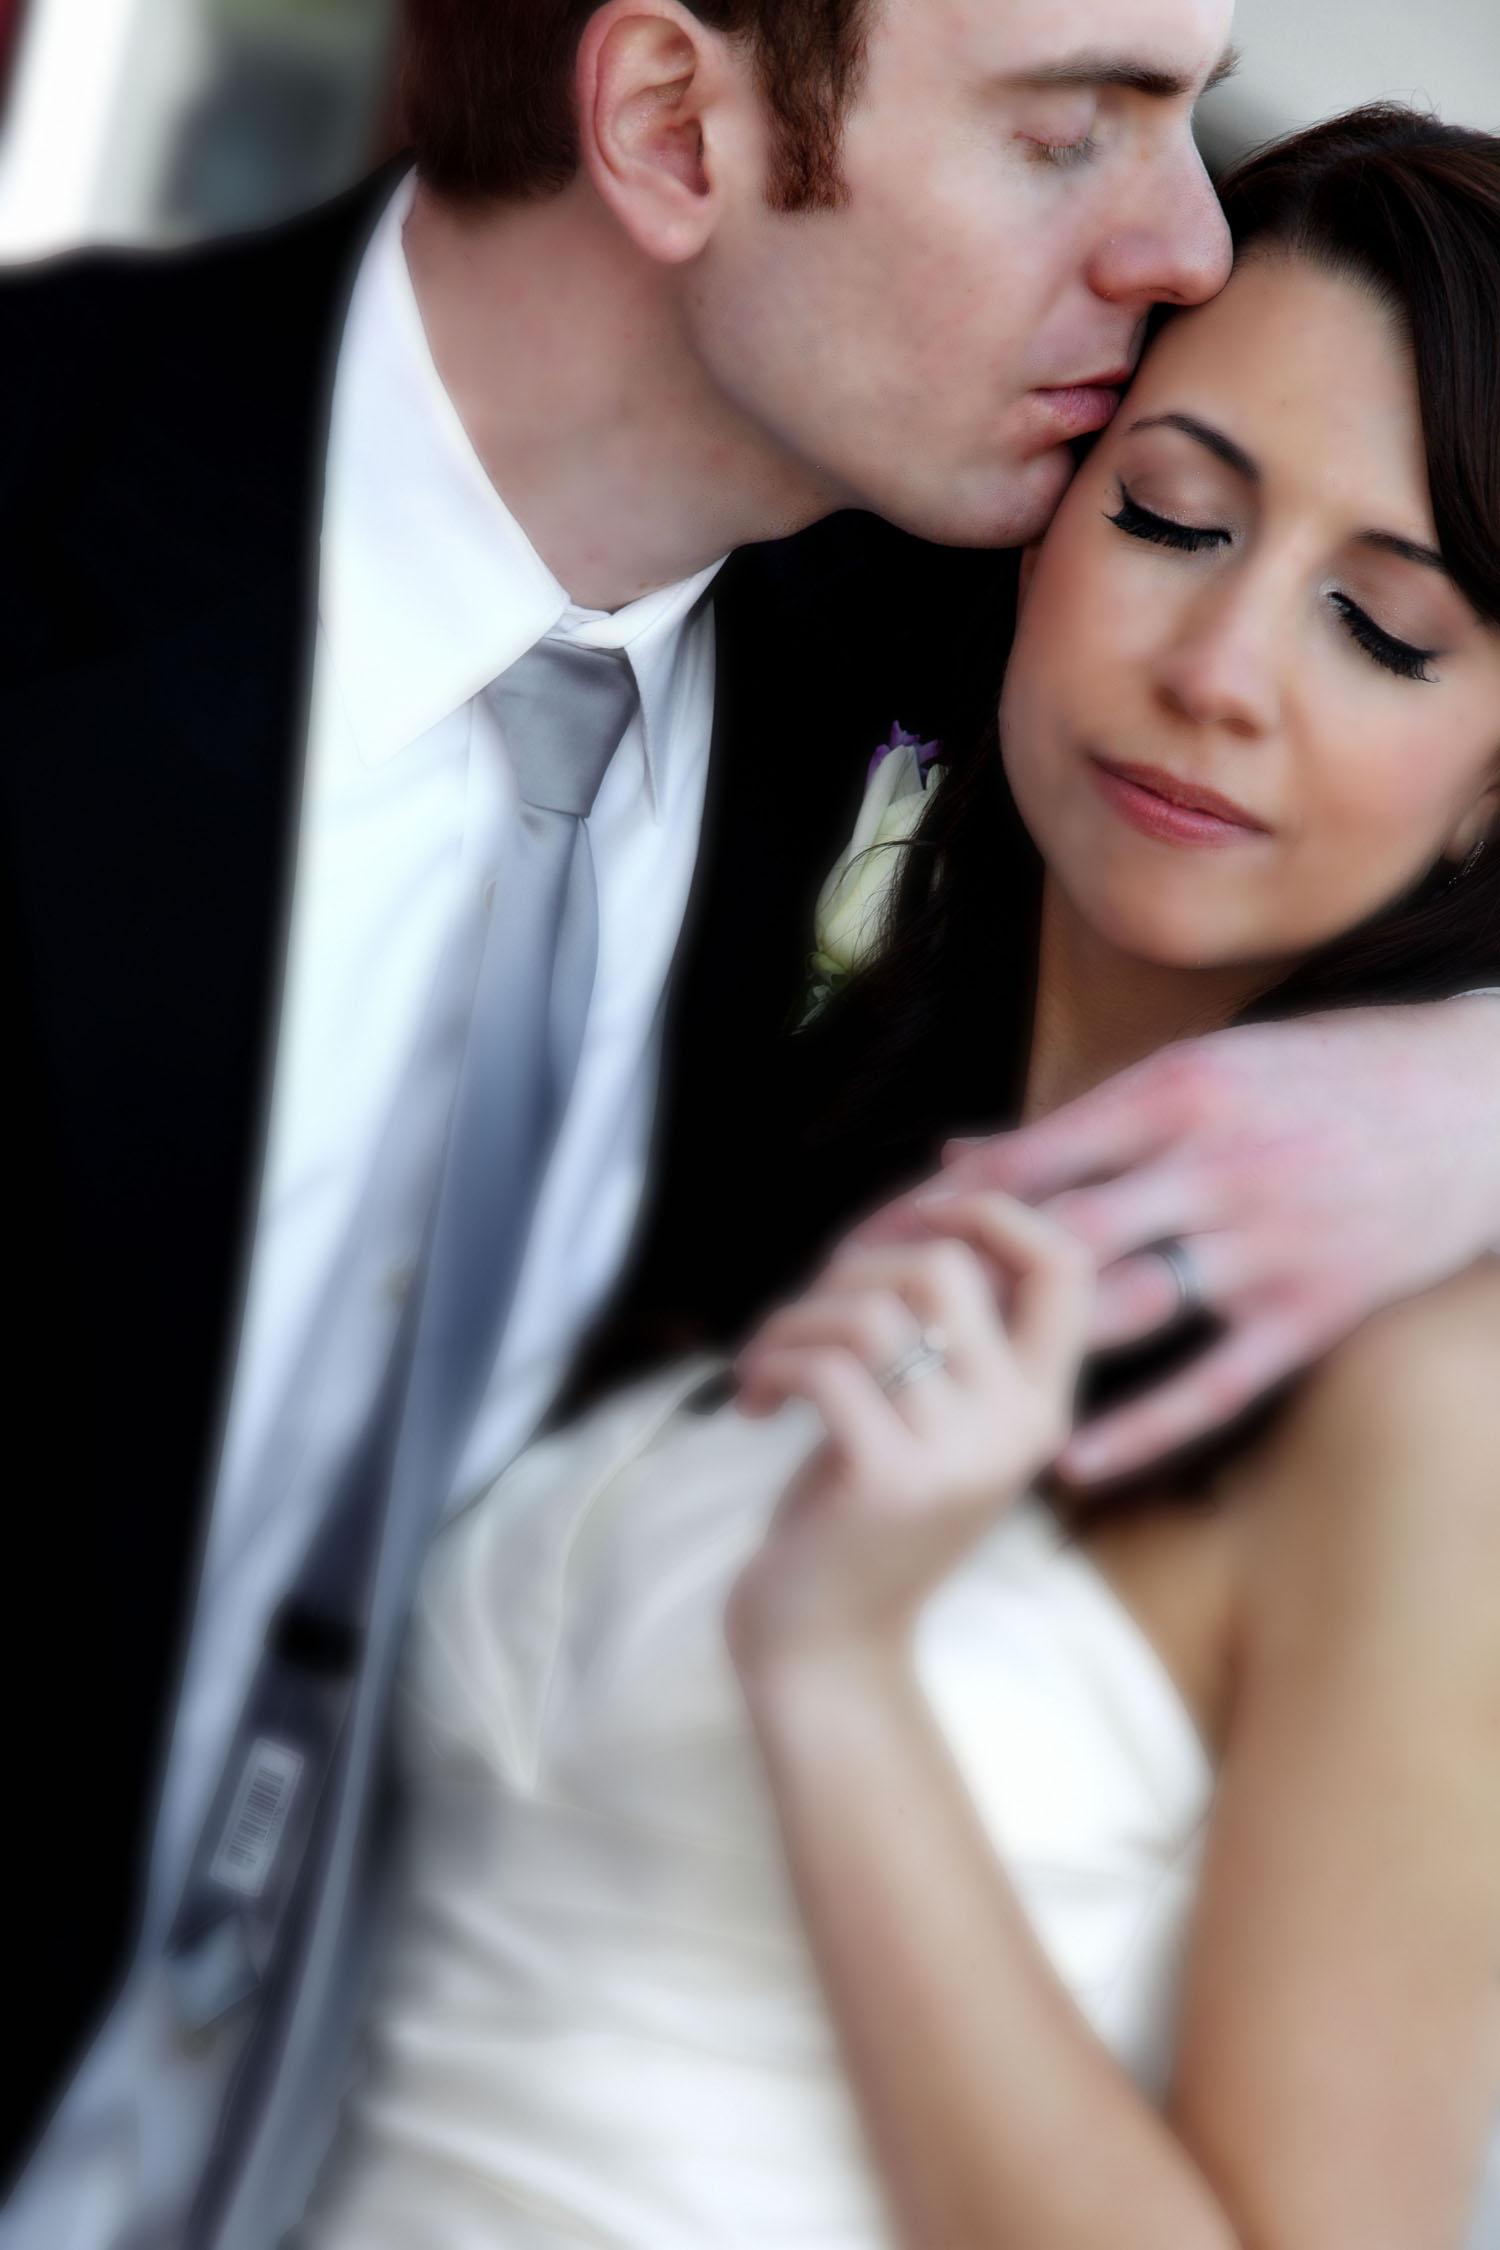 Rick-Ferro-Bride-and-Groom-Romantic-Portrait.jpg